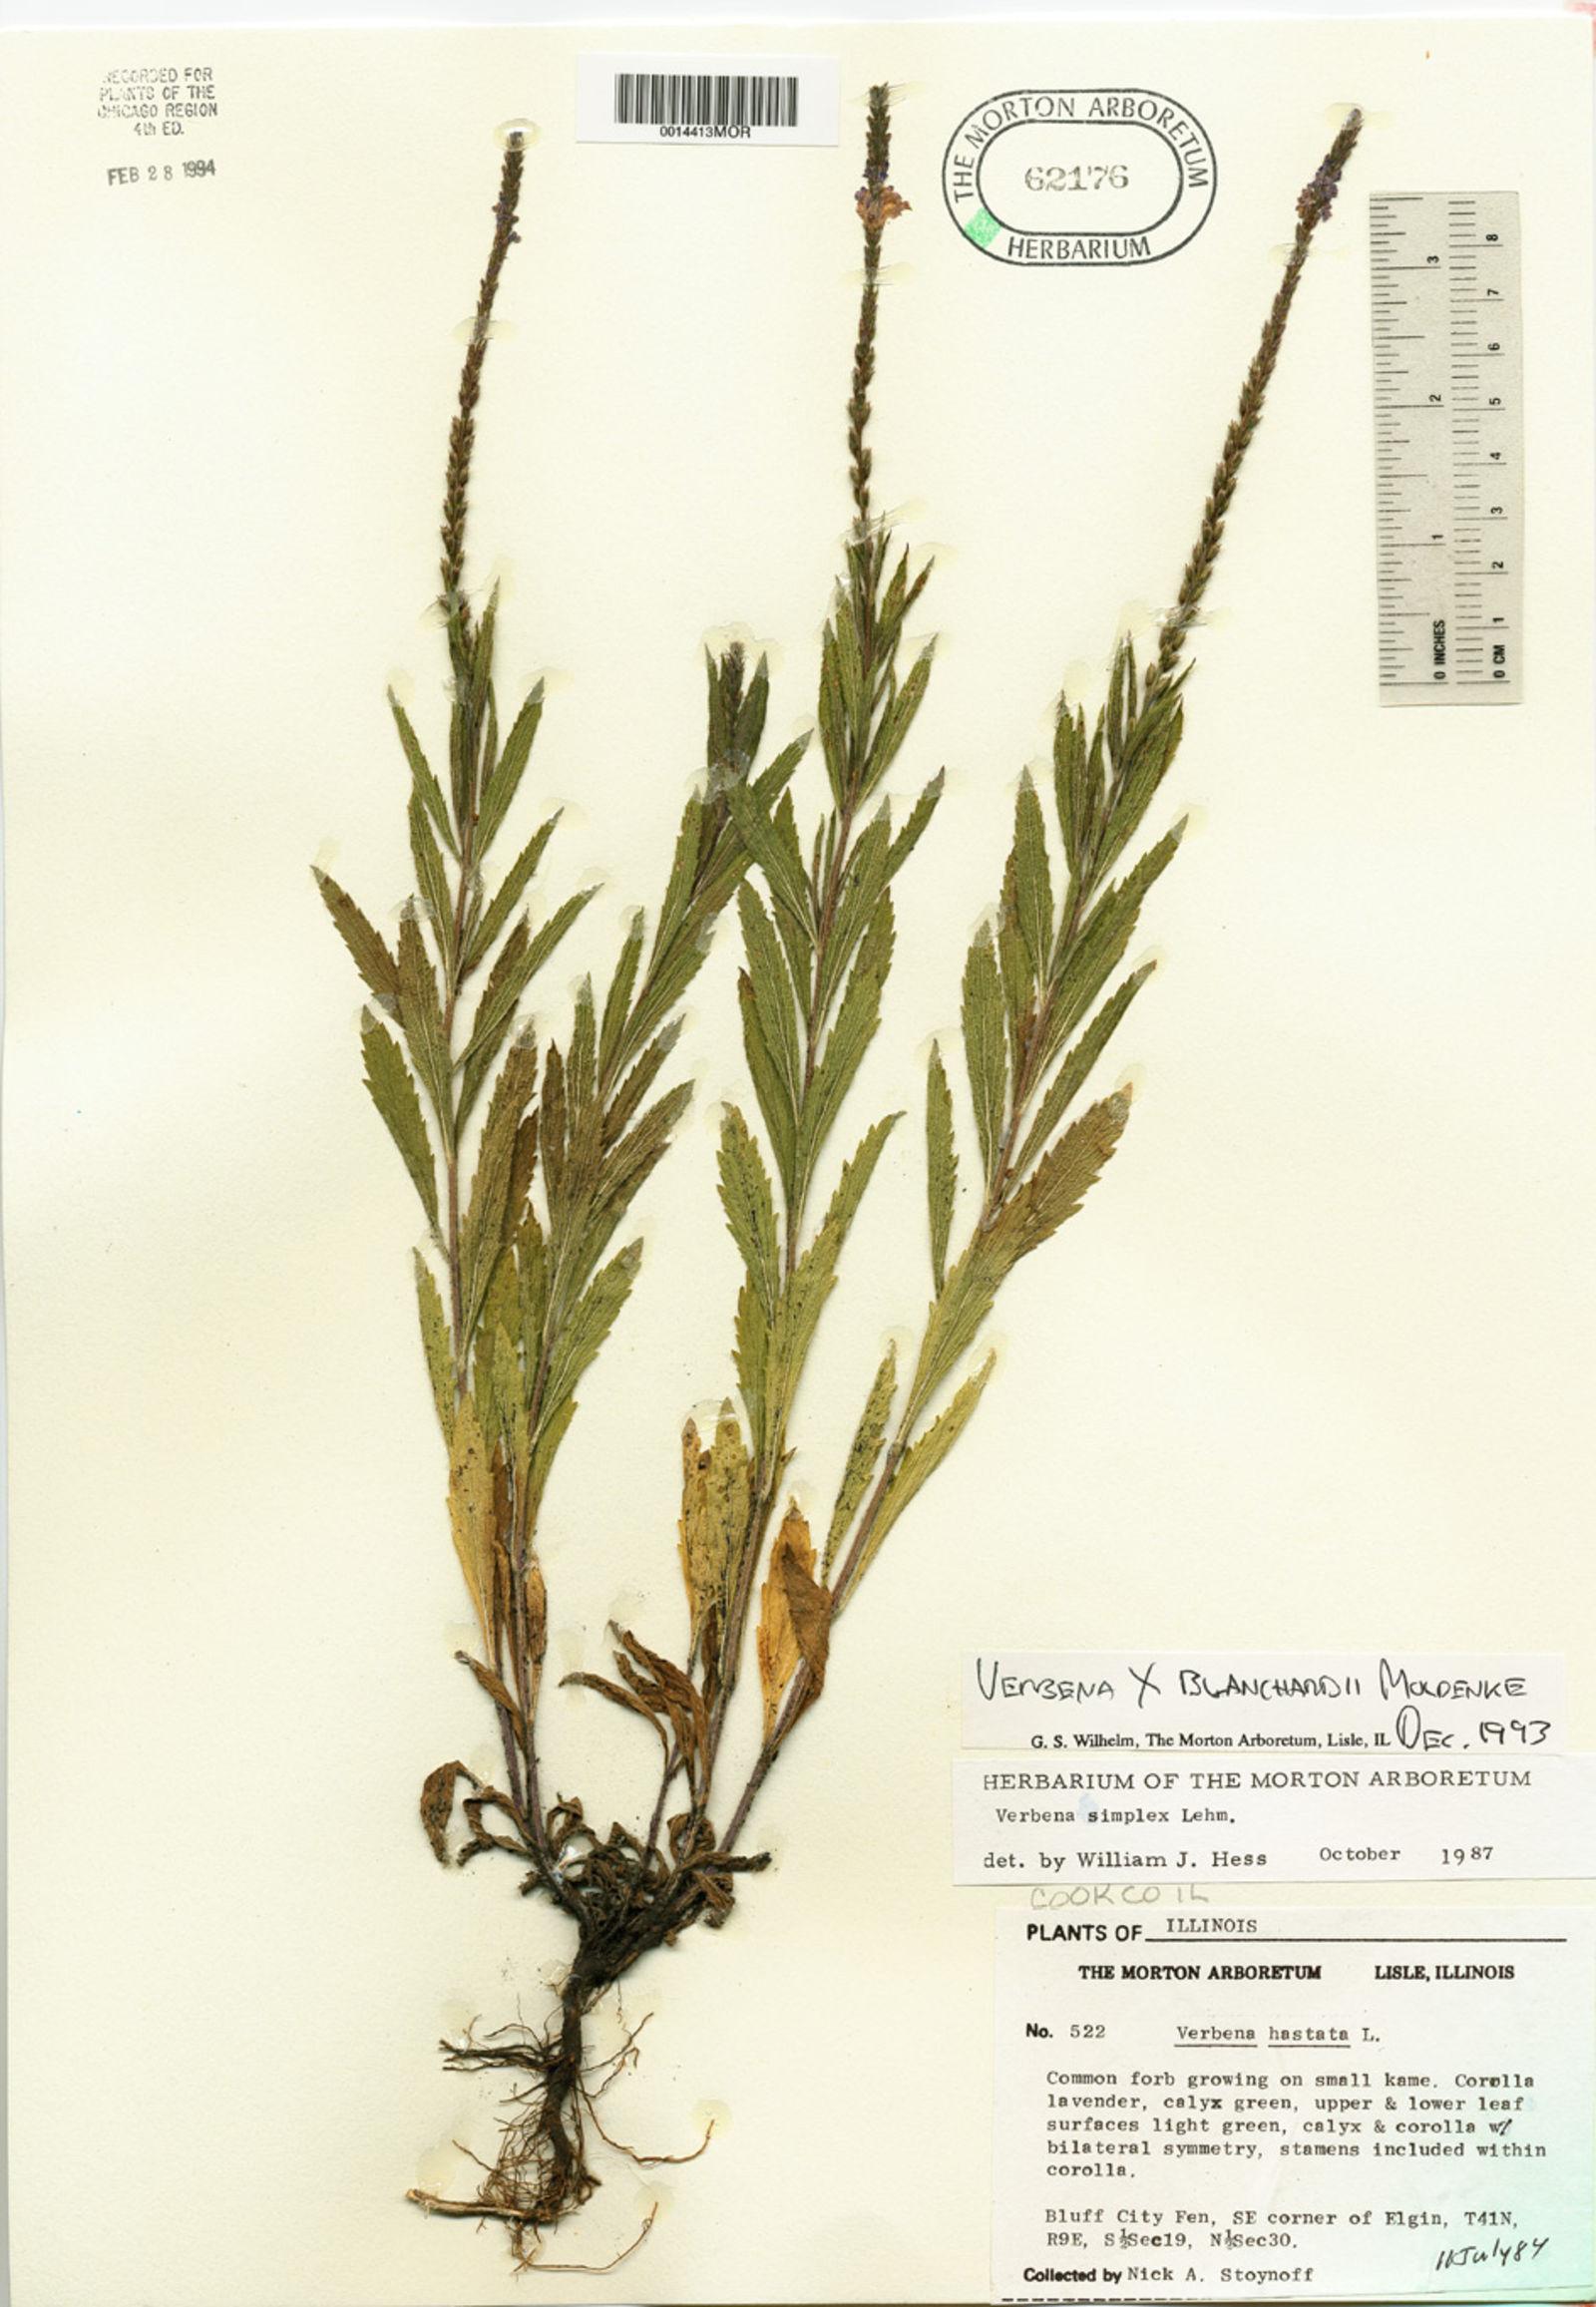 Verbena x blanchardii image